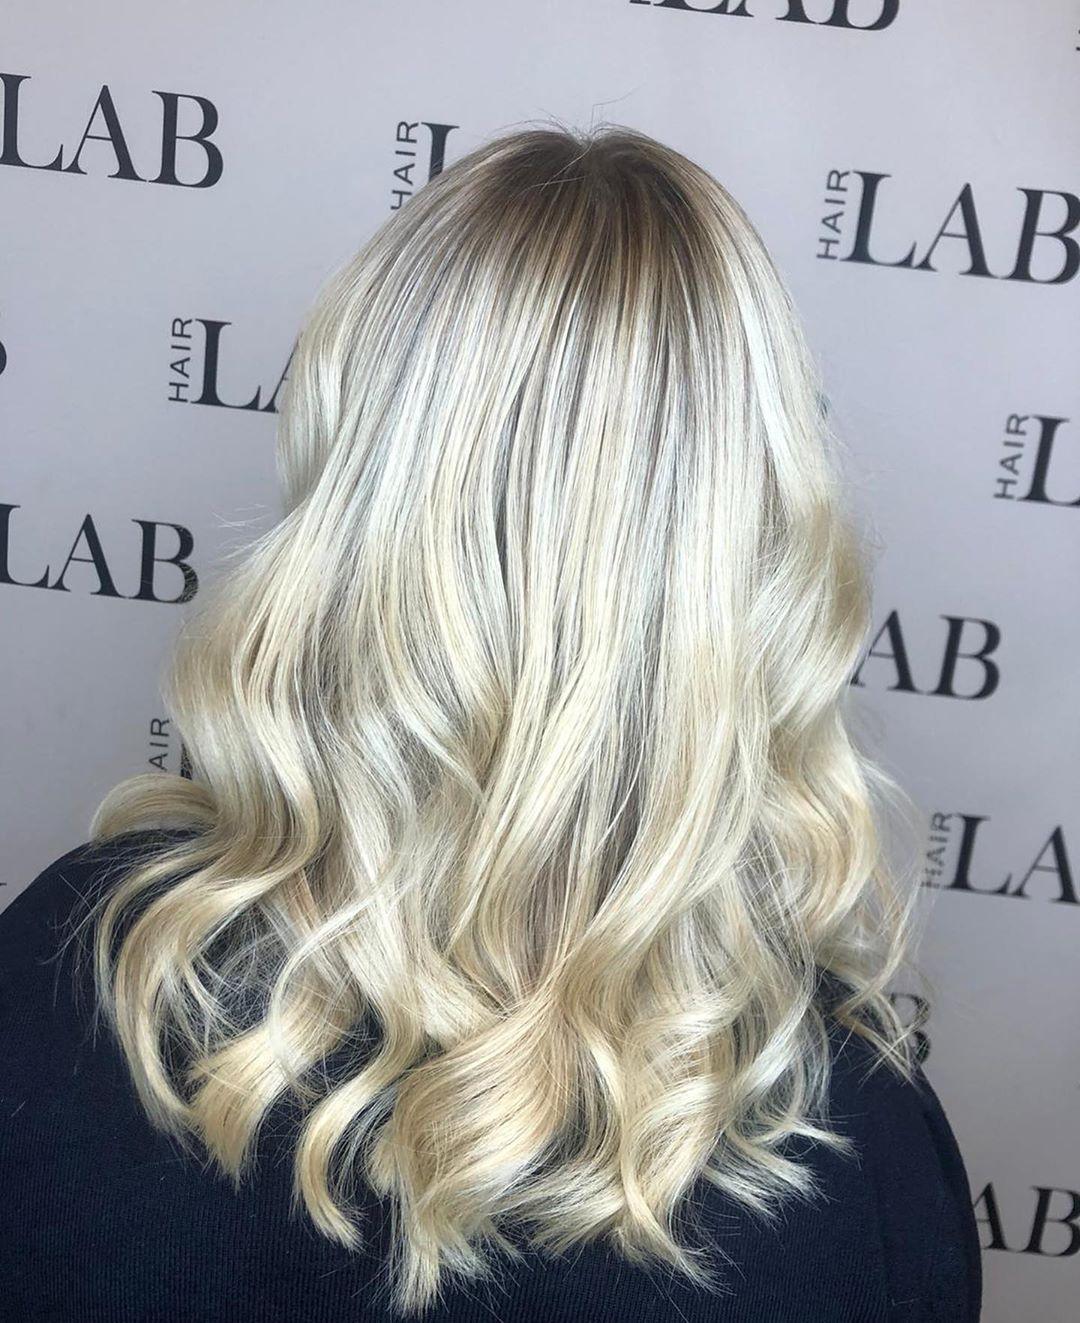 NEW CLIENT HAIR COLOUR OFFER AT HAIRLAB HAIR SALON IN BASINGSTOKE